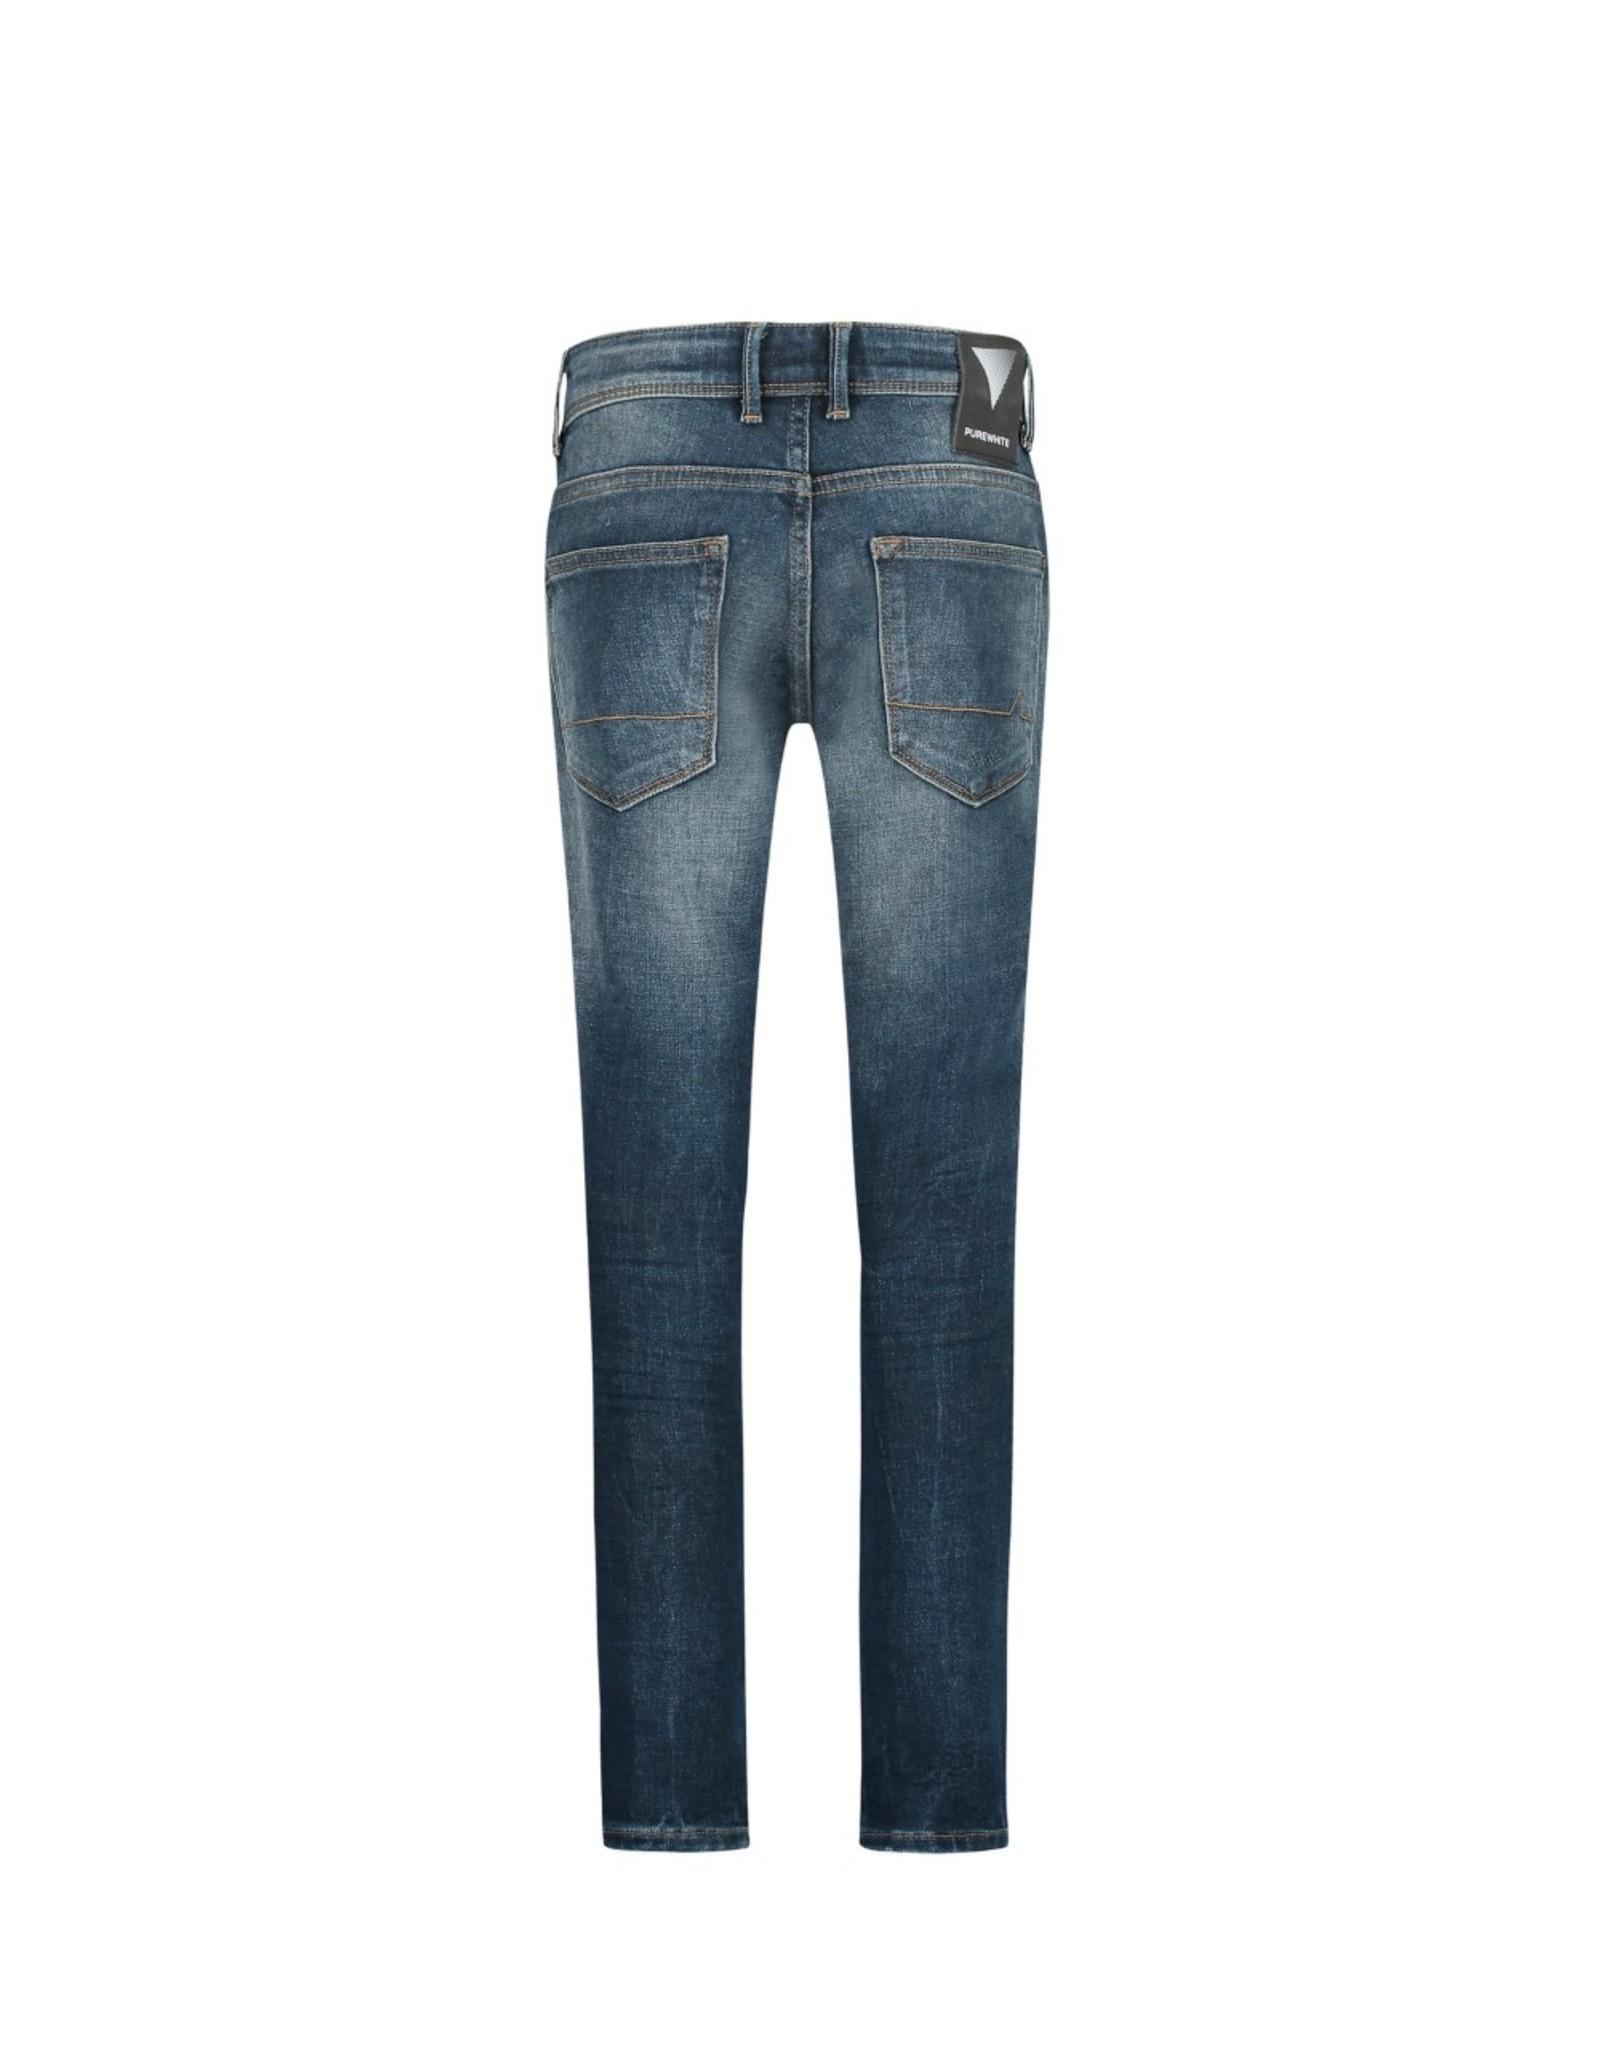 Ballin Amsterdam Jeans Blue X